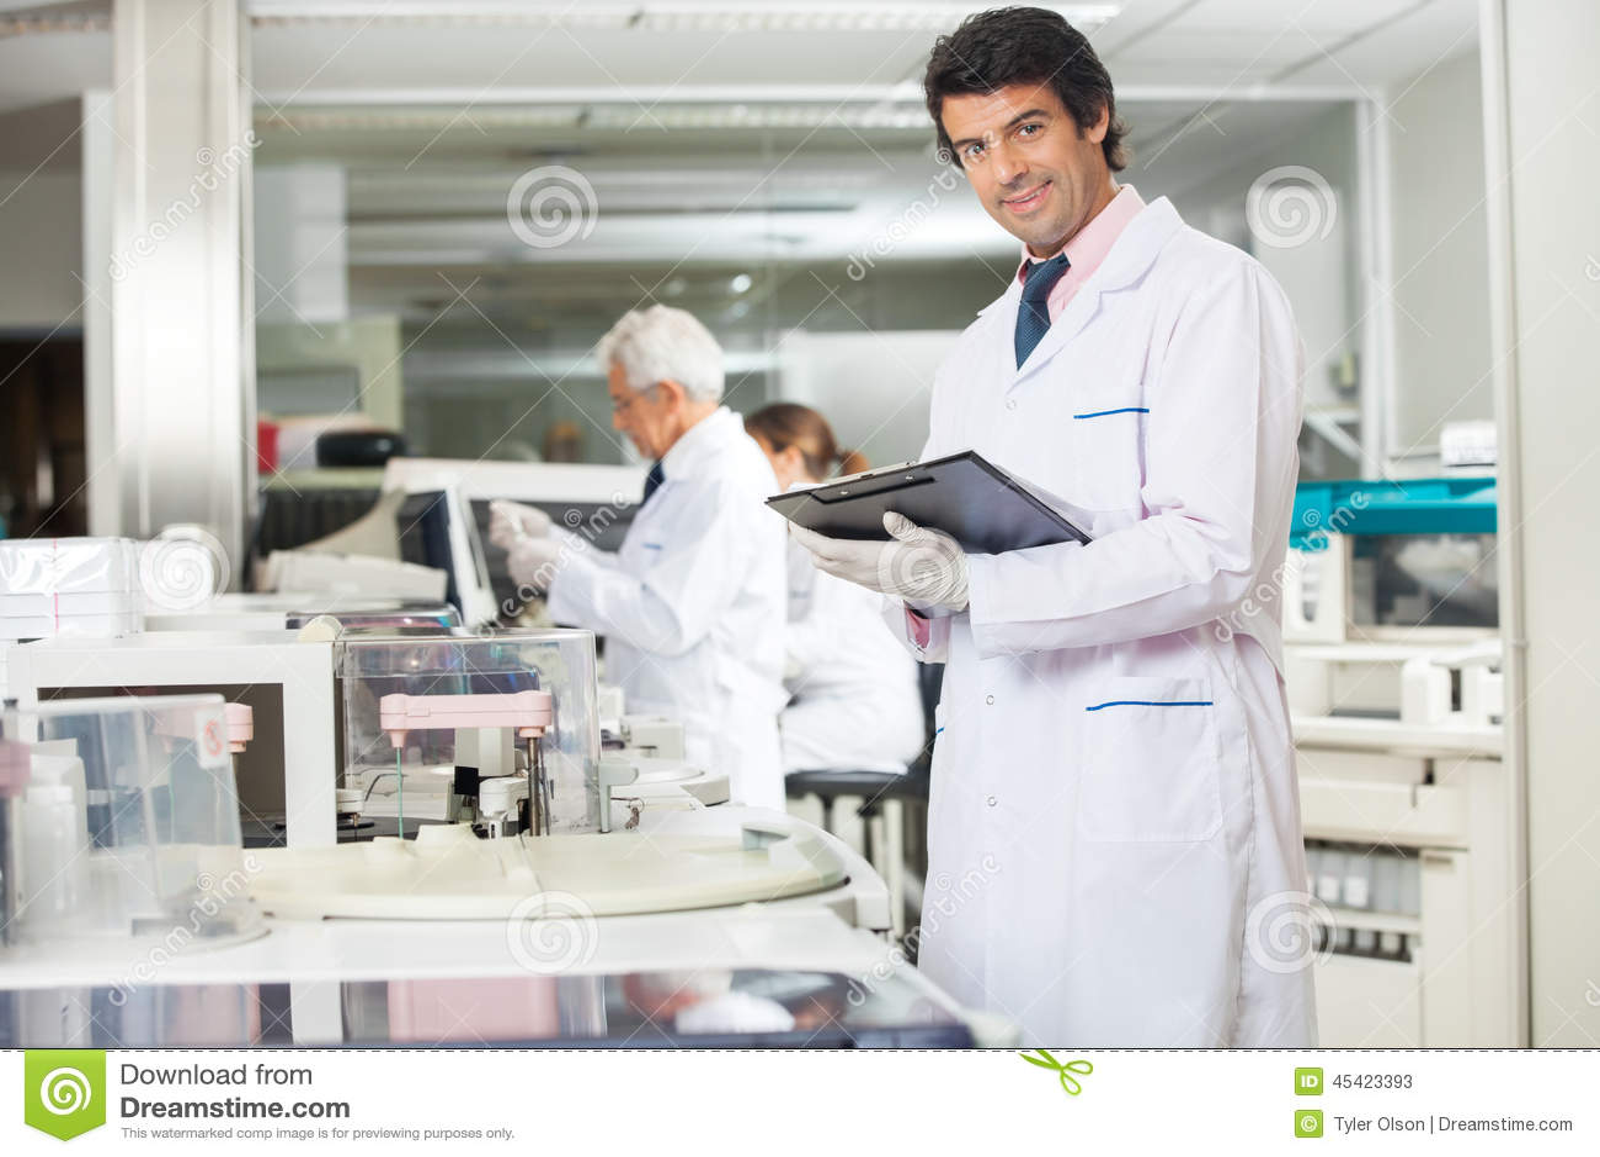 Male Technician With Clipboard